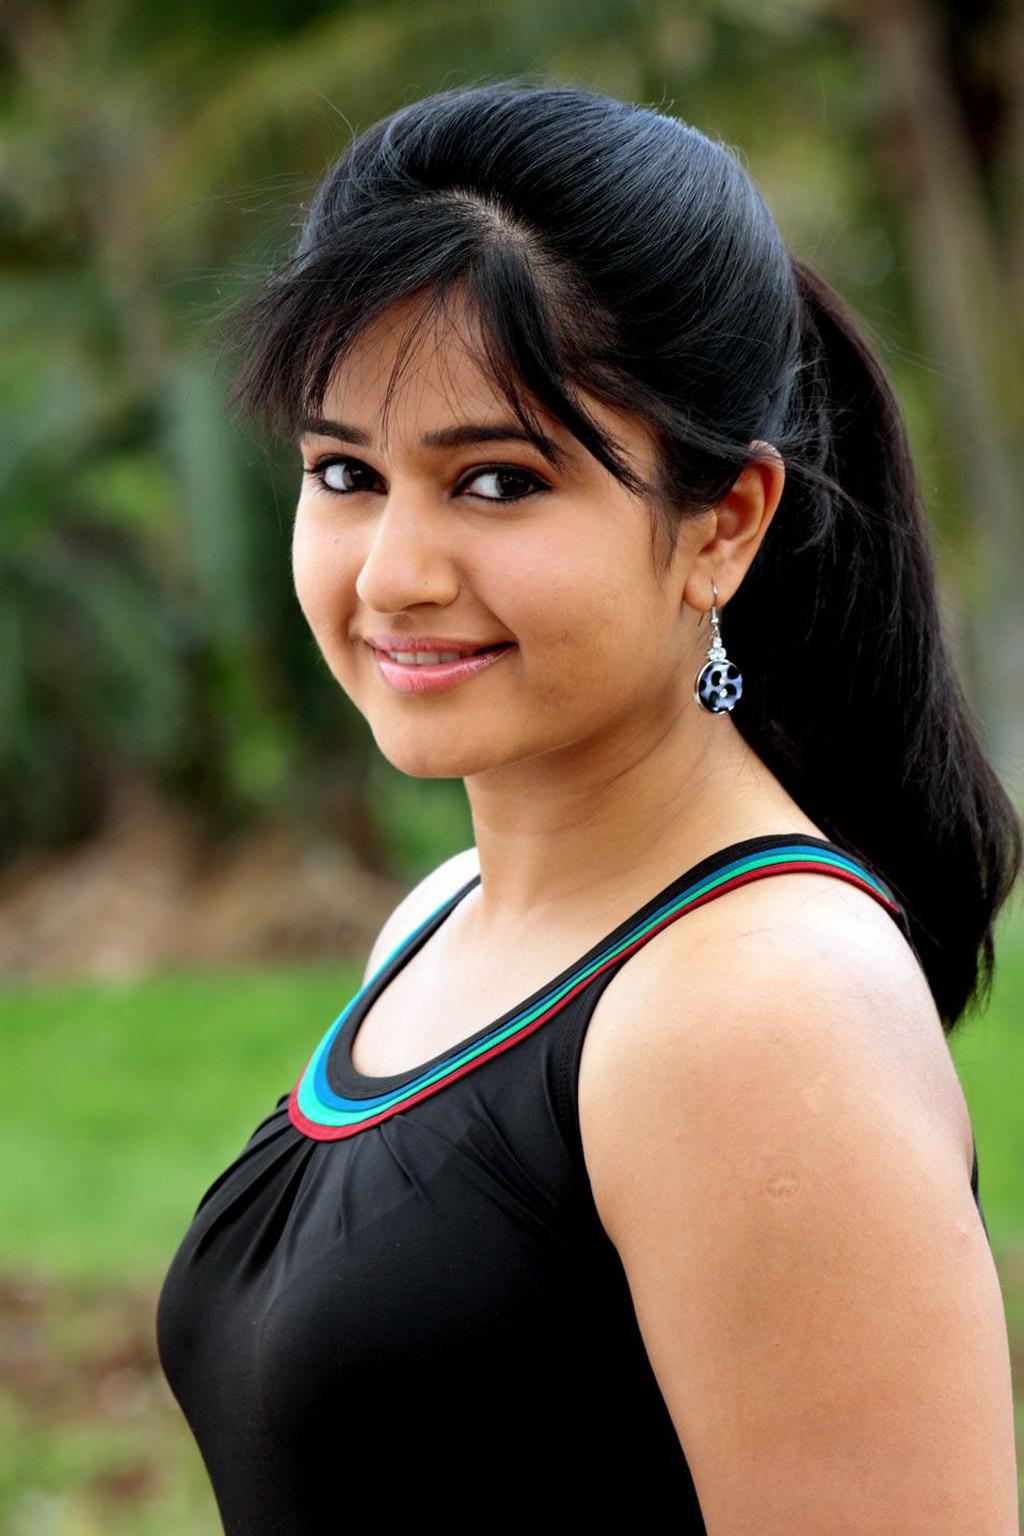 Poonam bajwa from manthrikan